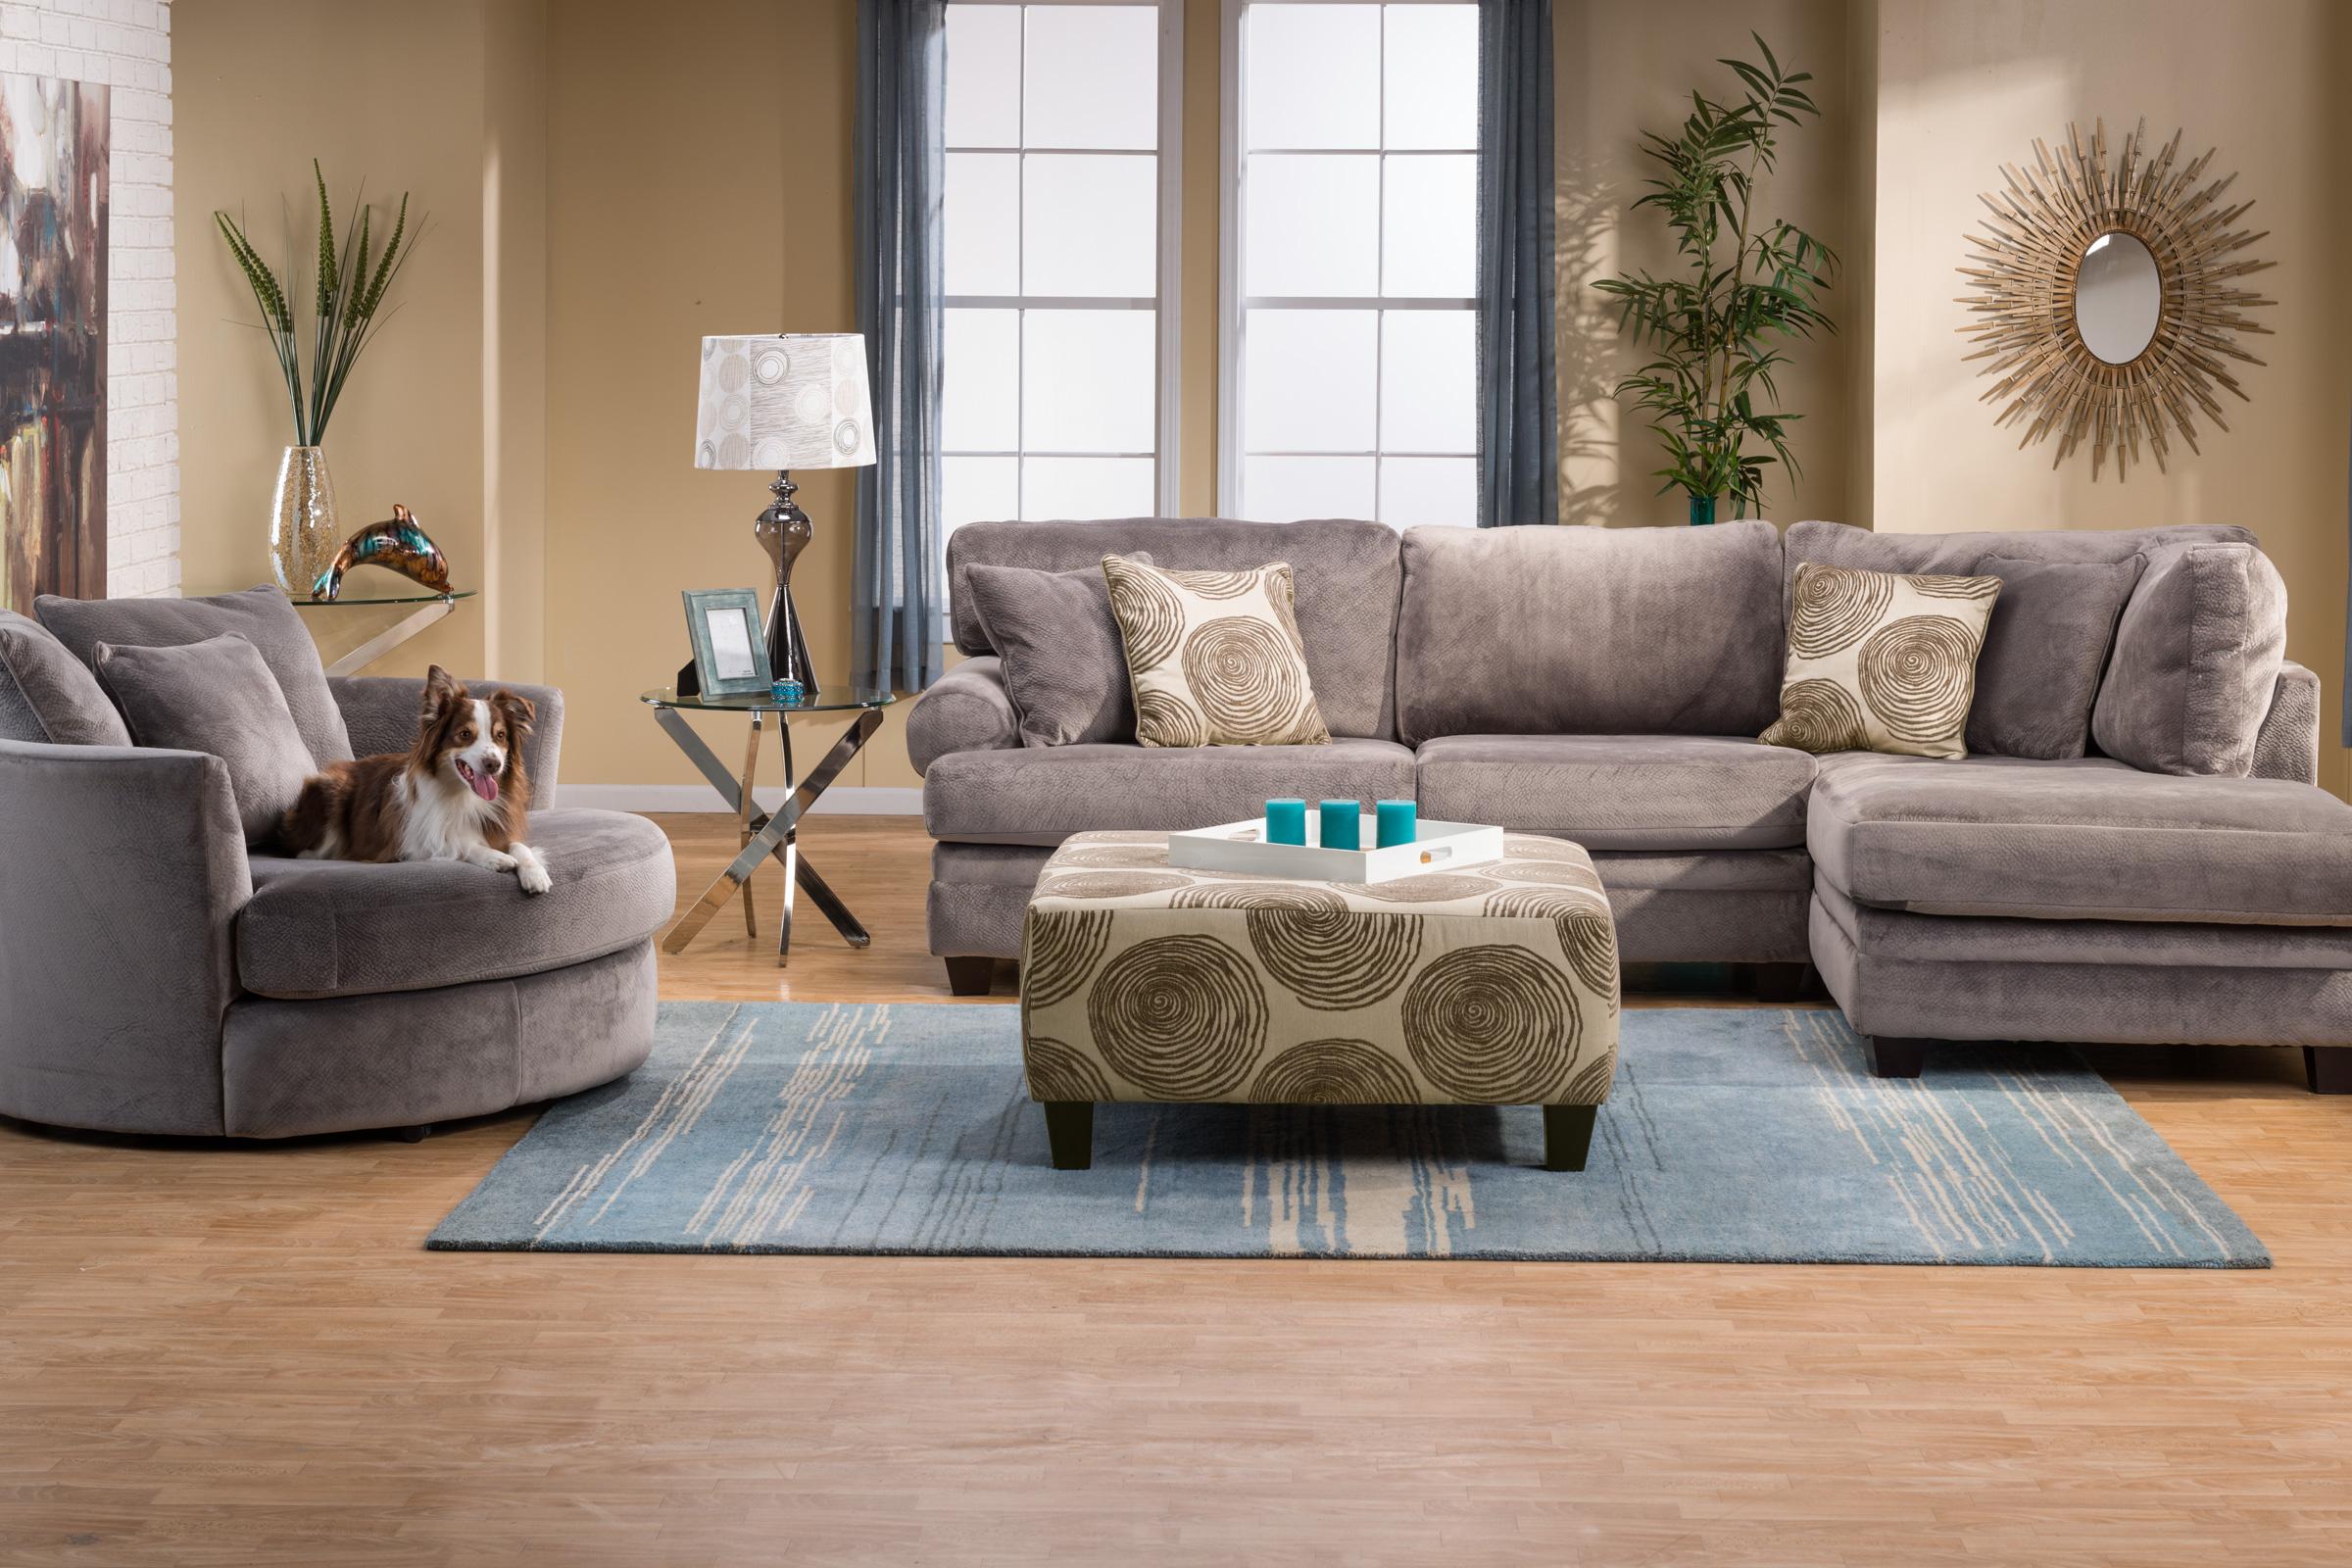 Living Room Furniture Steals You ll Love at Gardner White